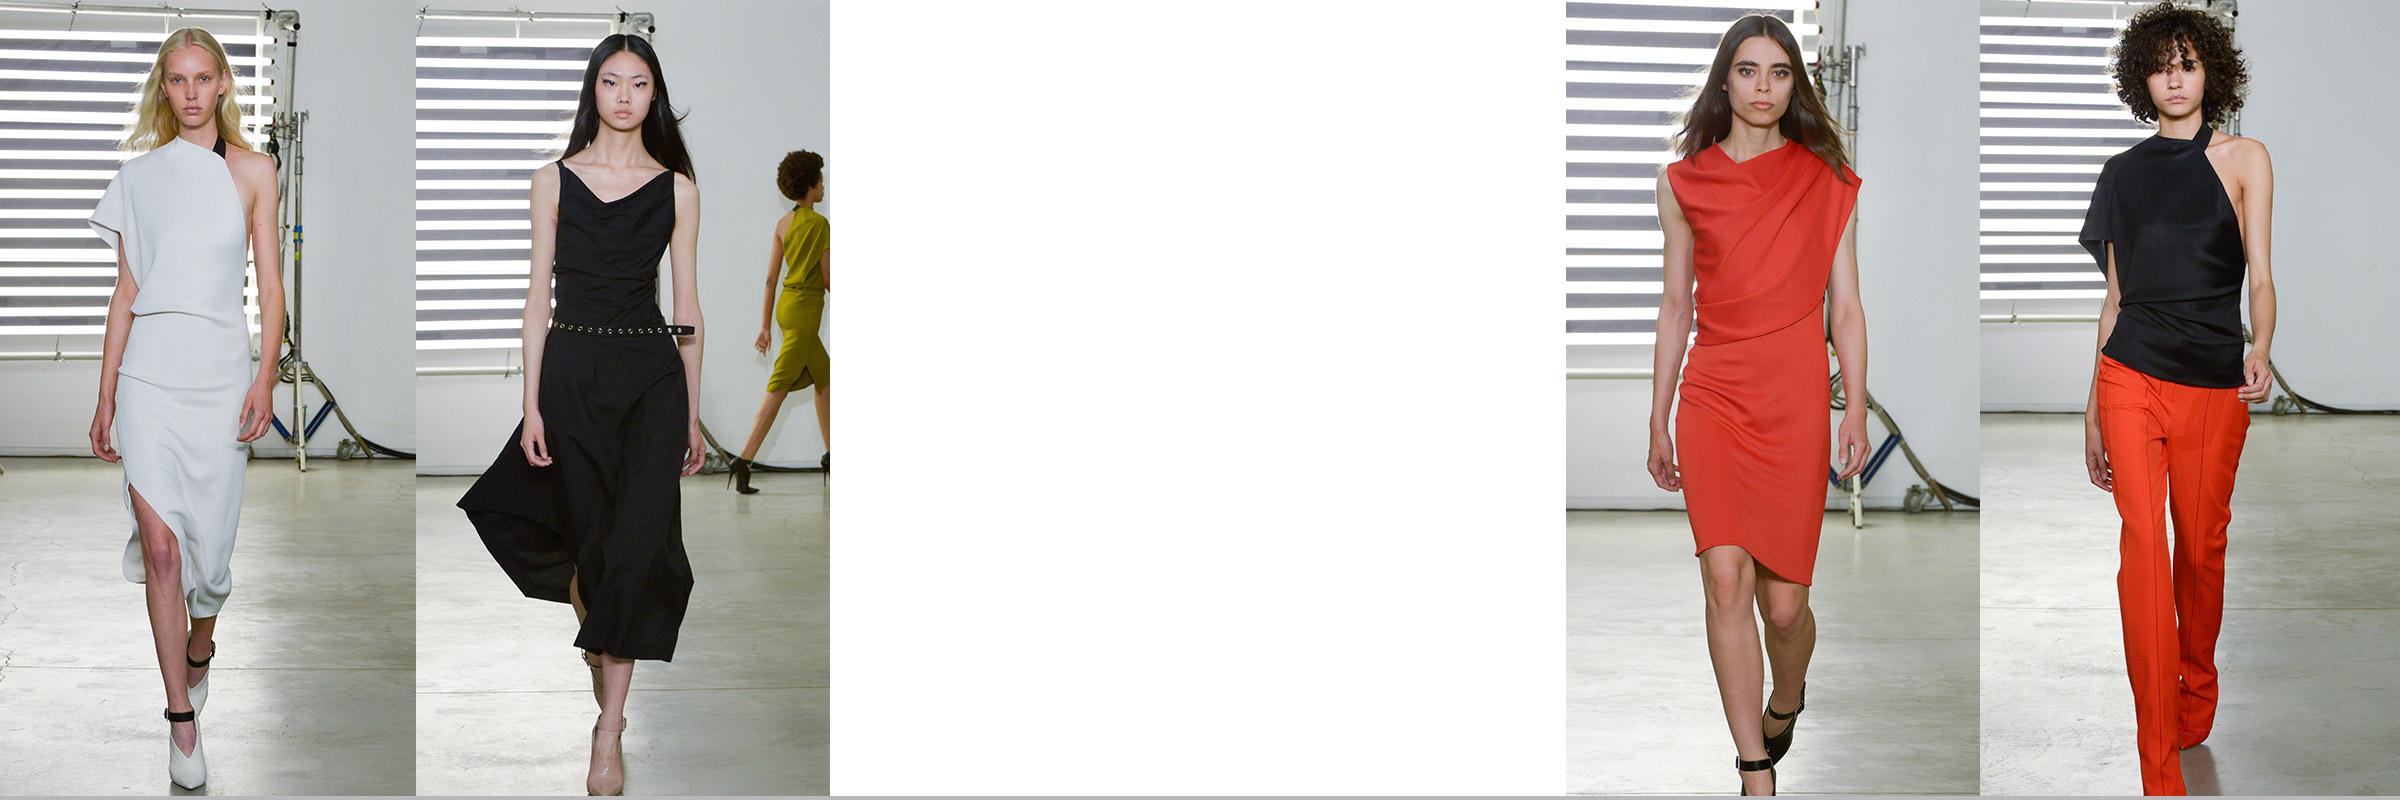 40312f96f71 Narciso Rodriguez Trunkshow | Moda Operandi